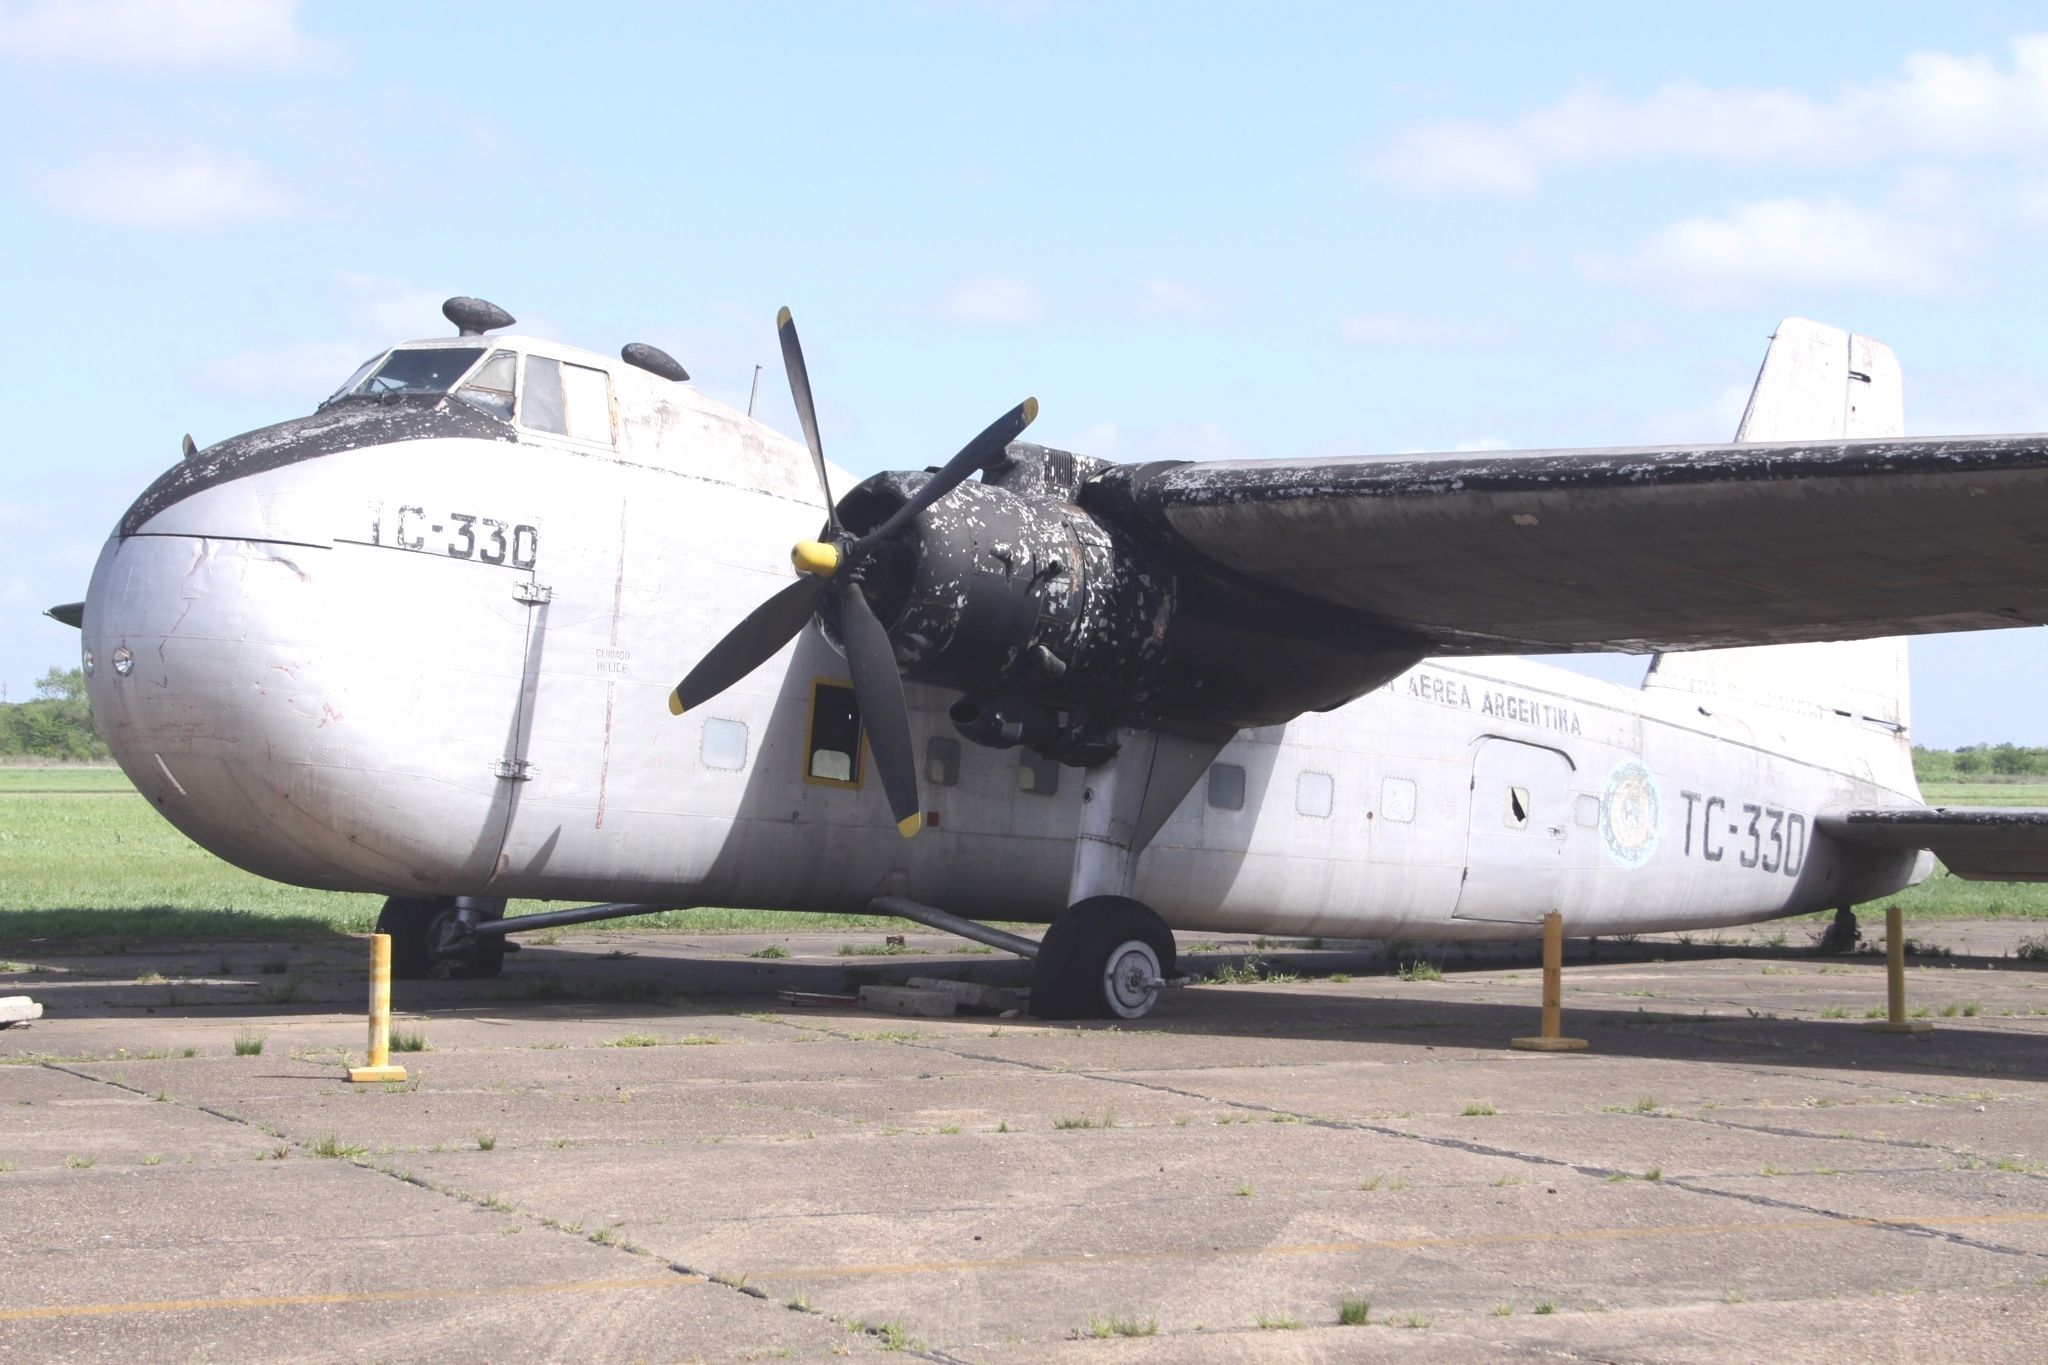 argentina air force_3650 argentina recetas travel